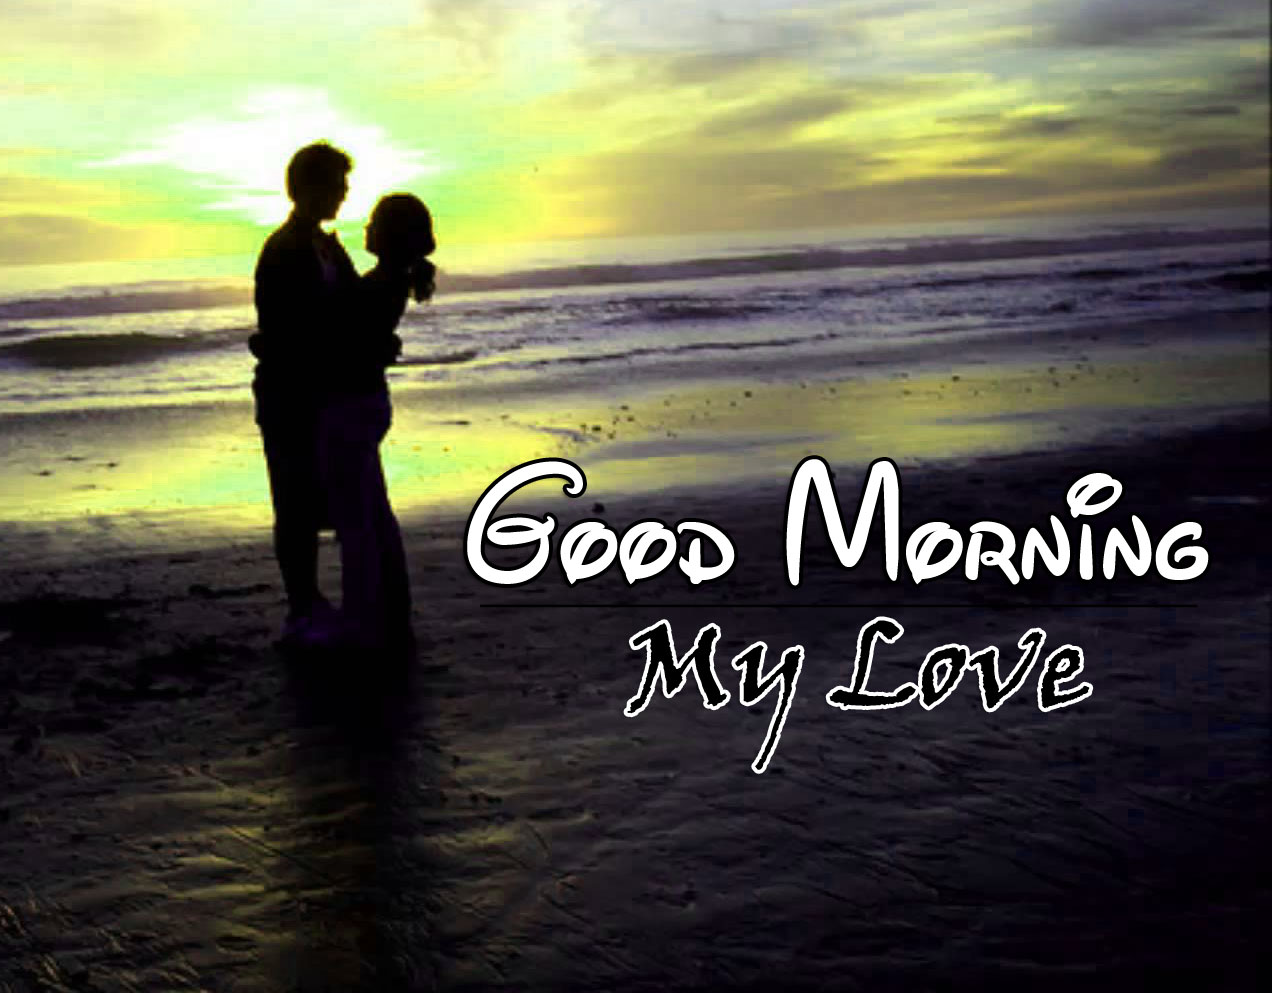 Latest Romantic Good Morning Wallpaper Hd